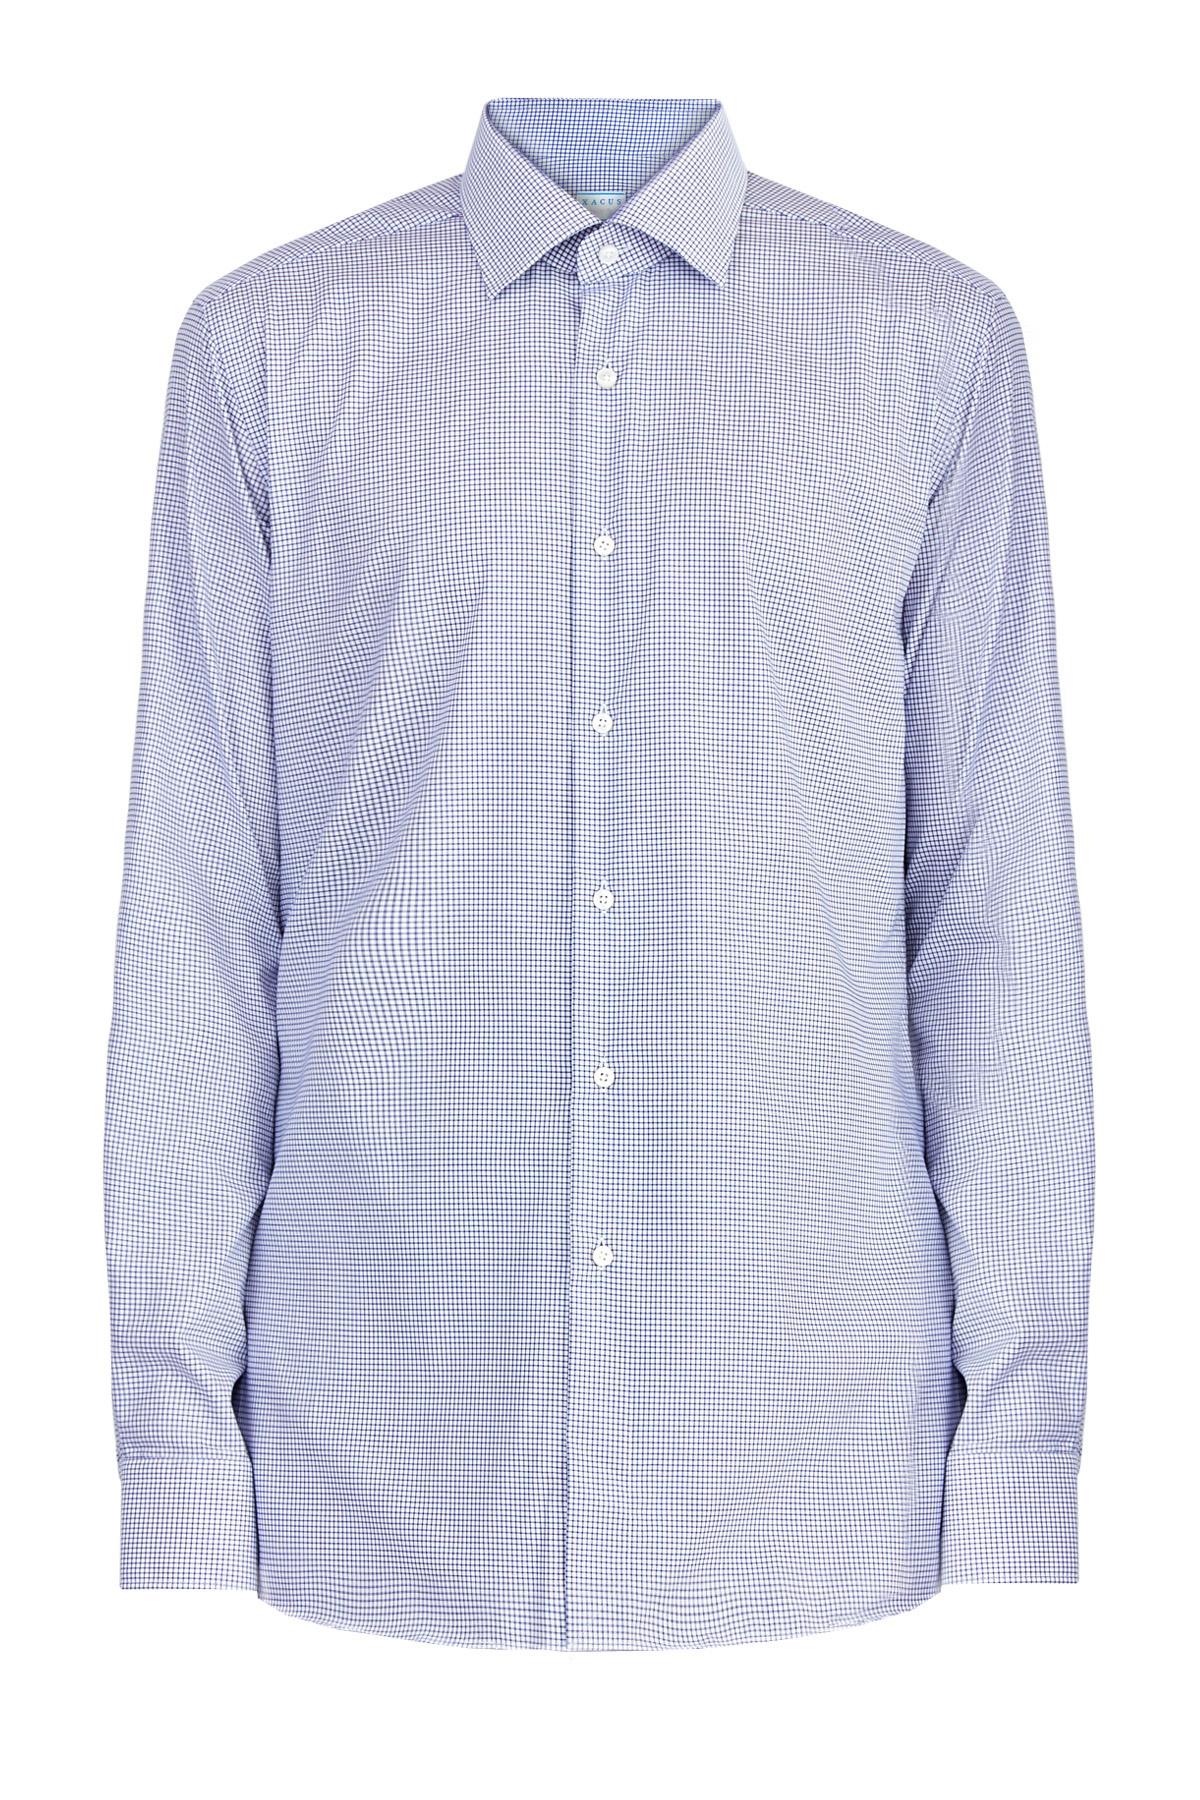 Рубашка из хлопка Wrinkle Free с микро-принтом в клетку